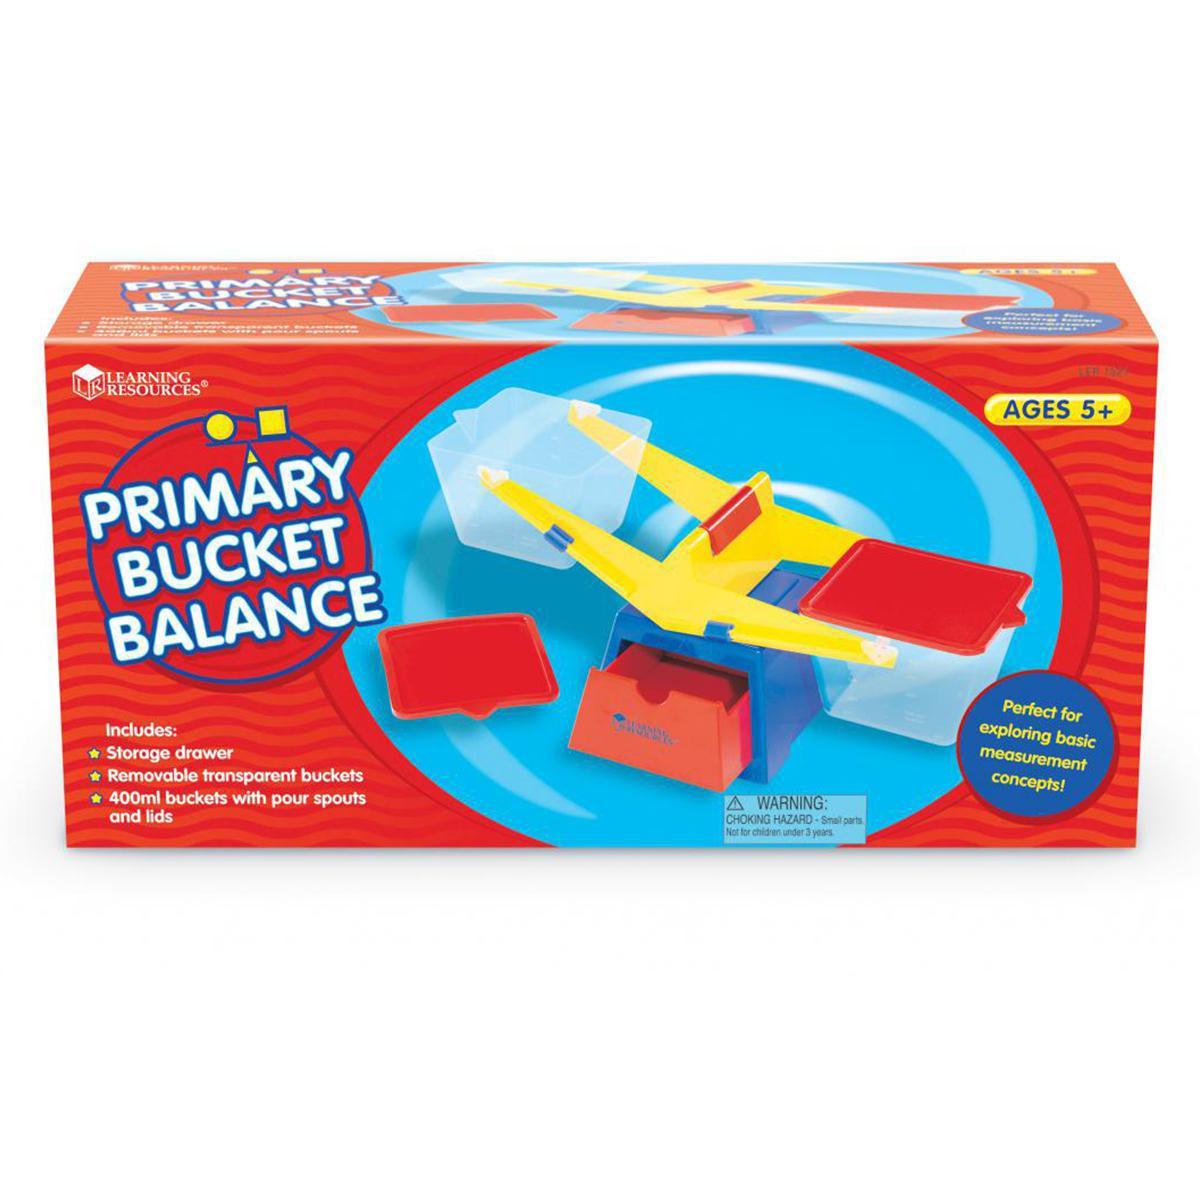 Primary Bucket Balance